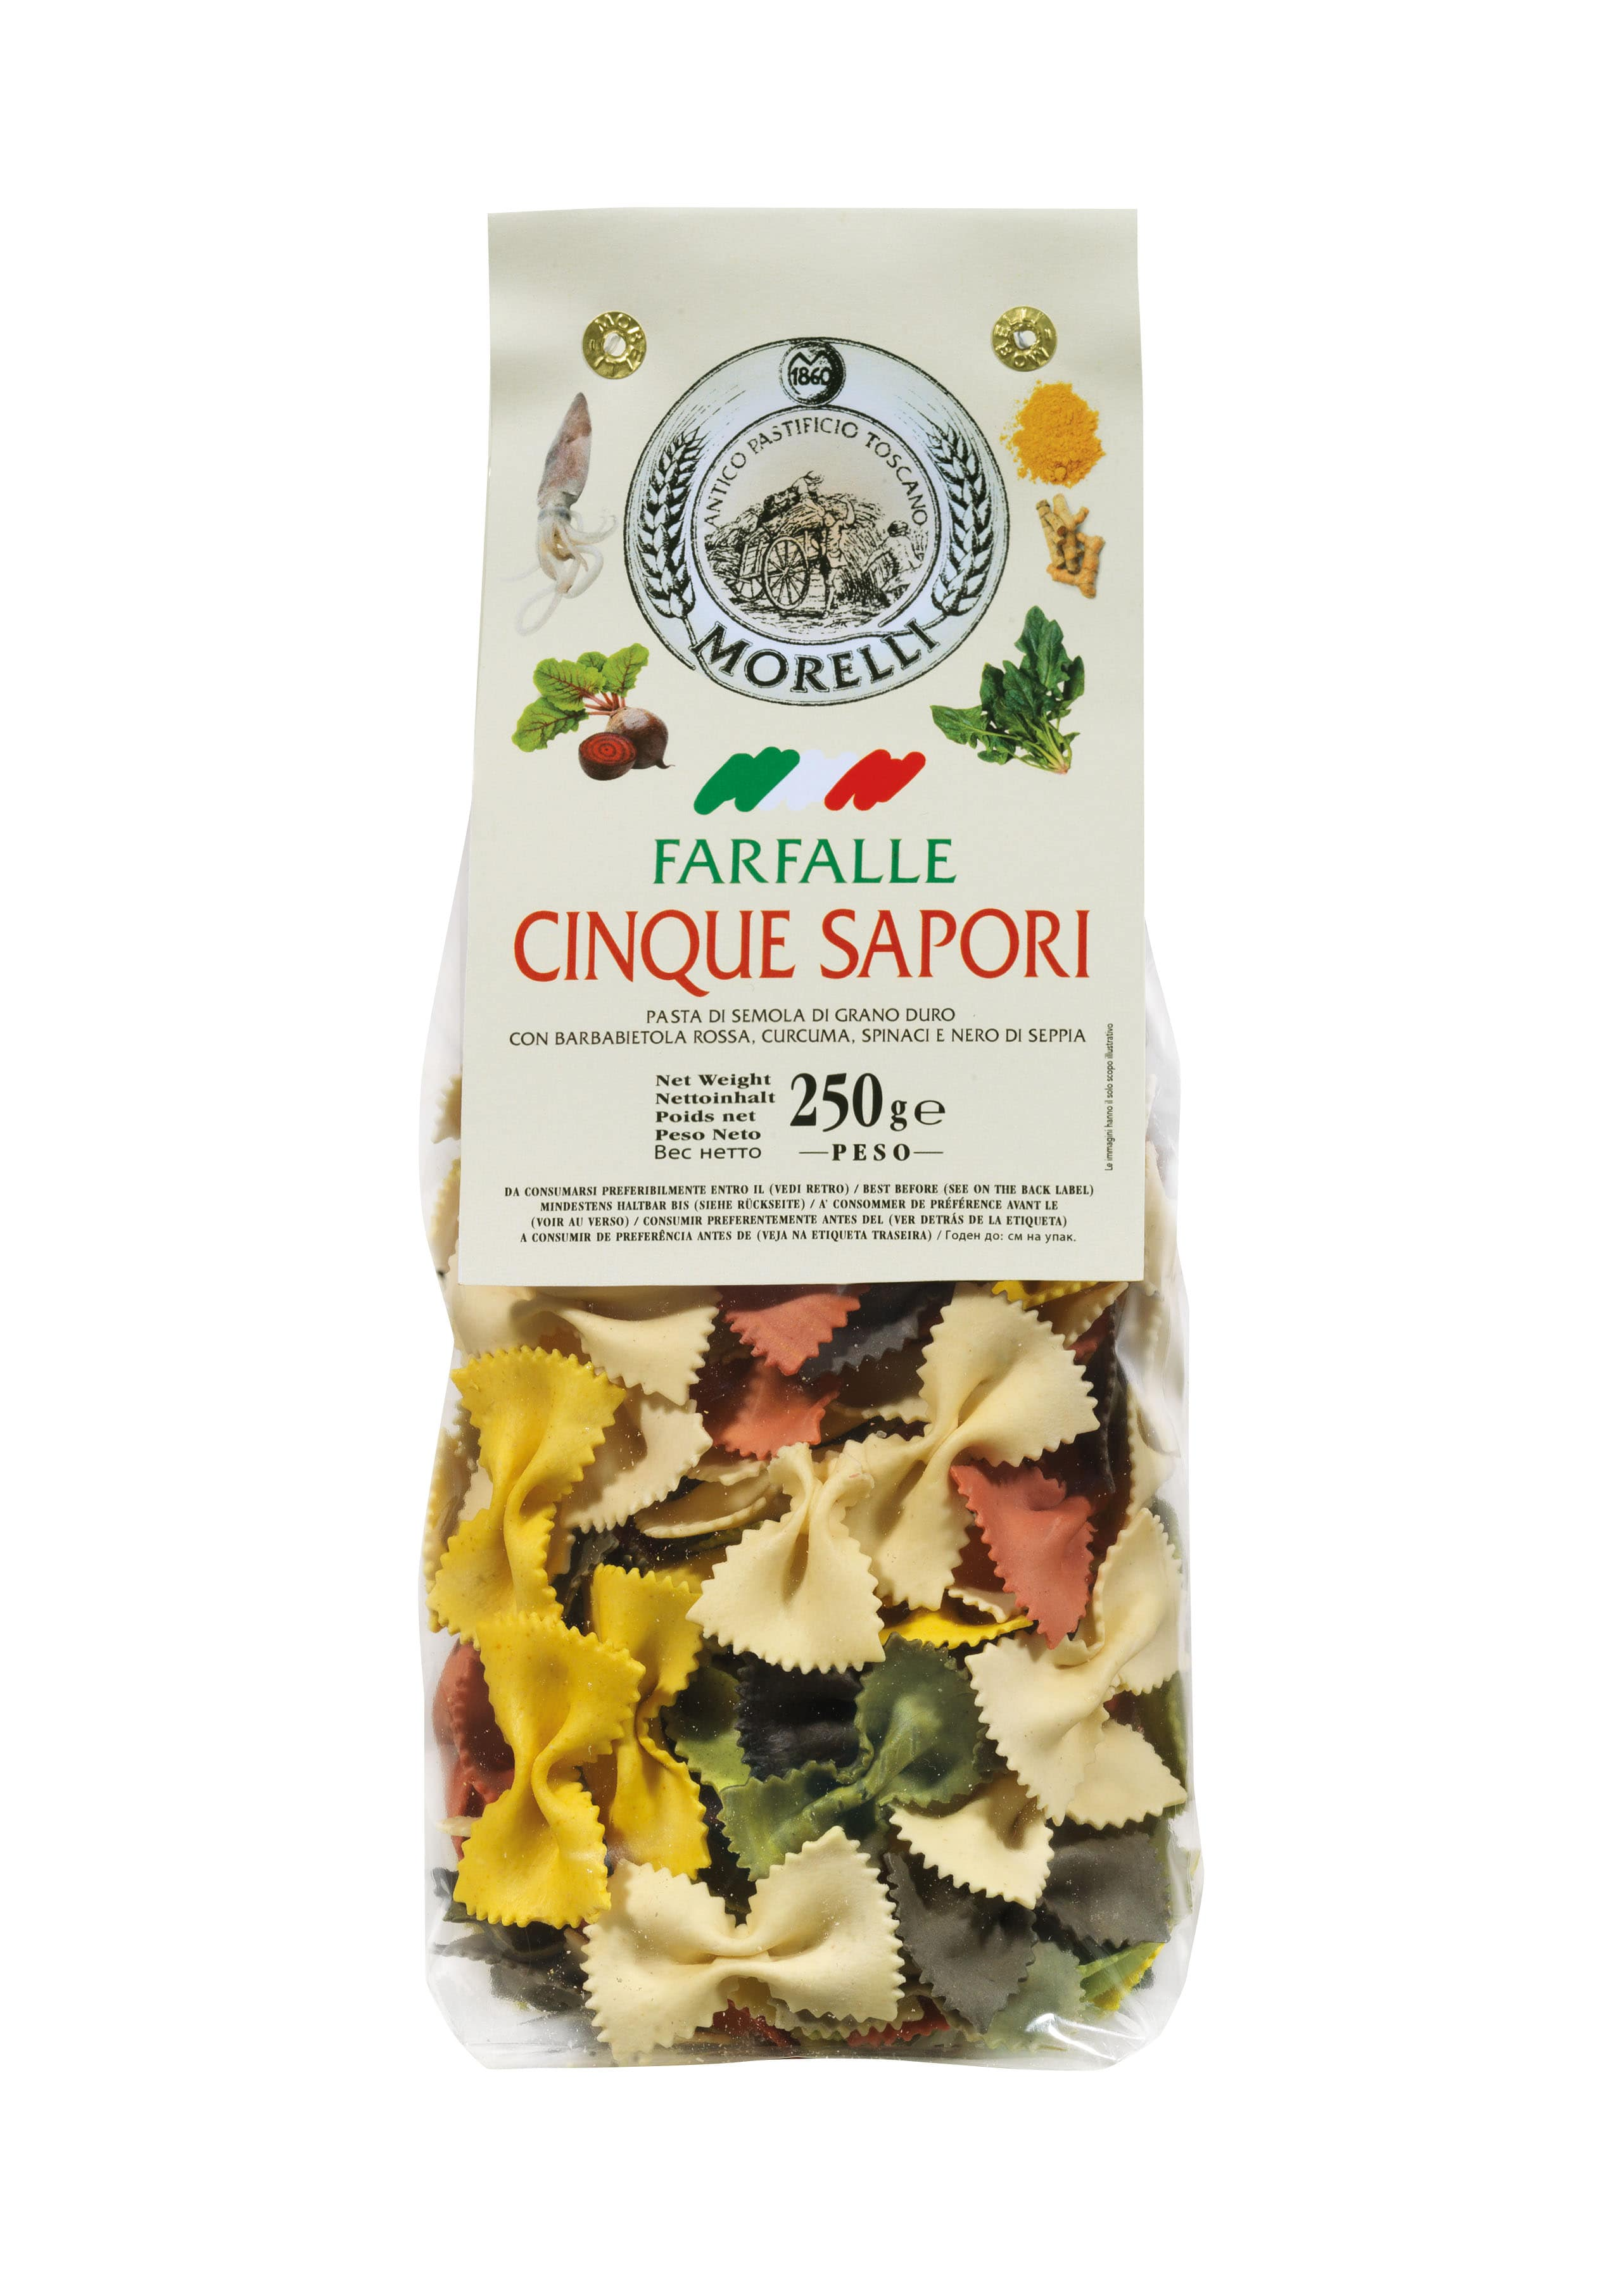 Farfalle 5 saveurs, Morelli (250 g)